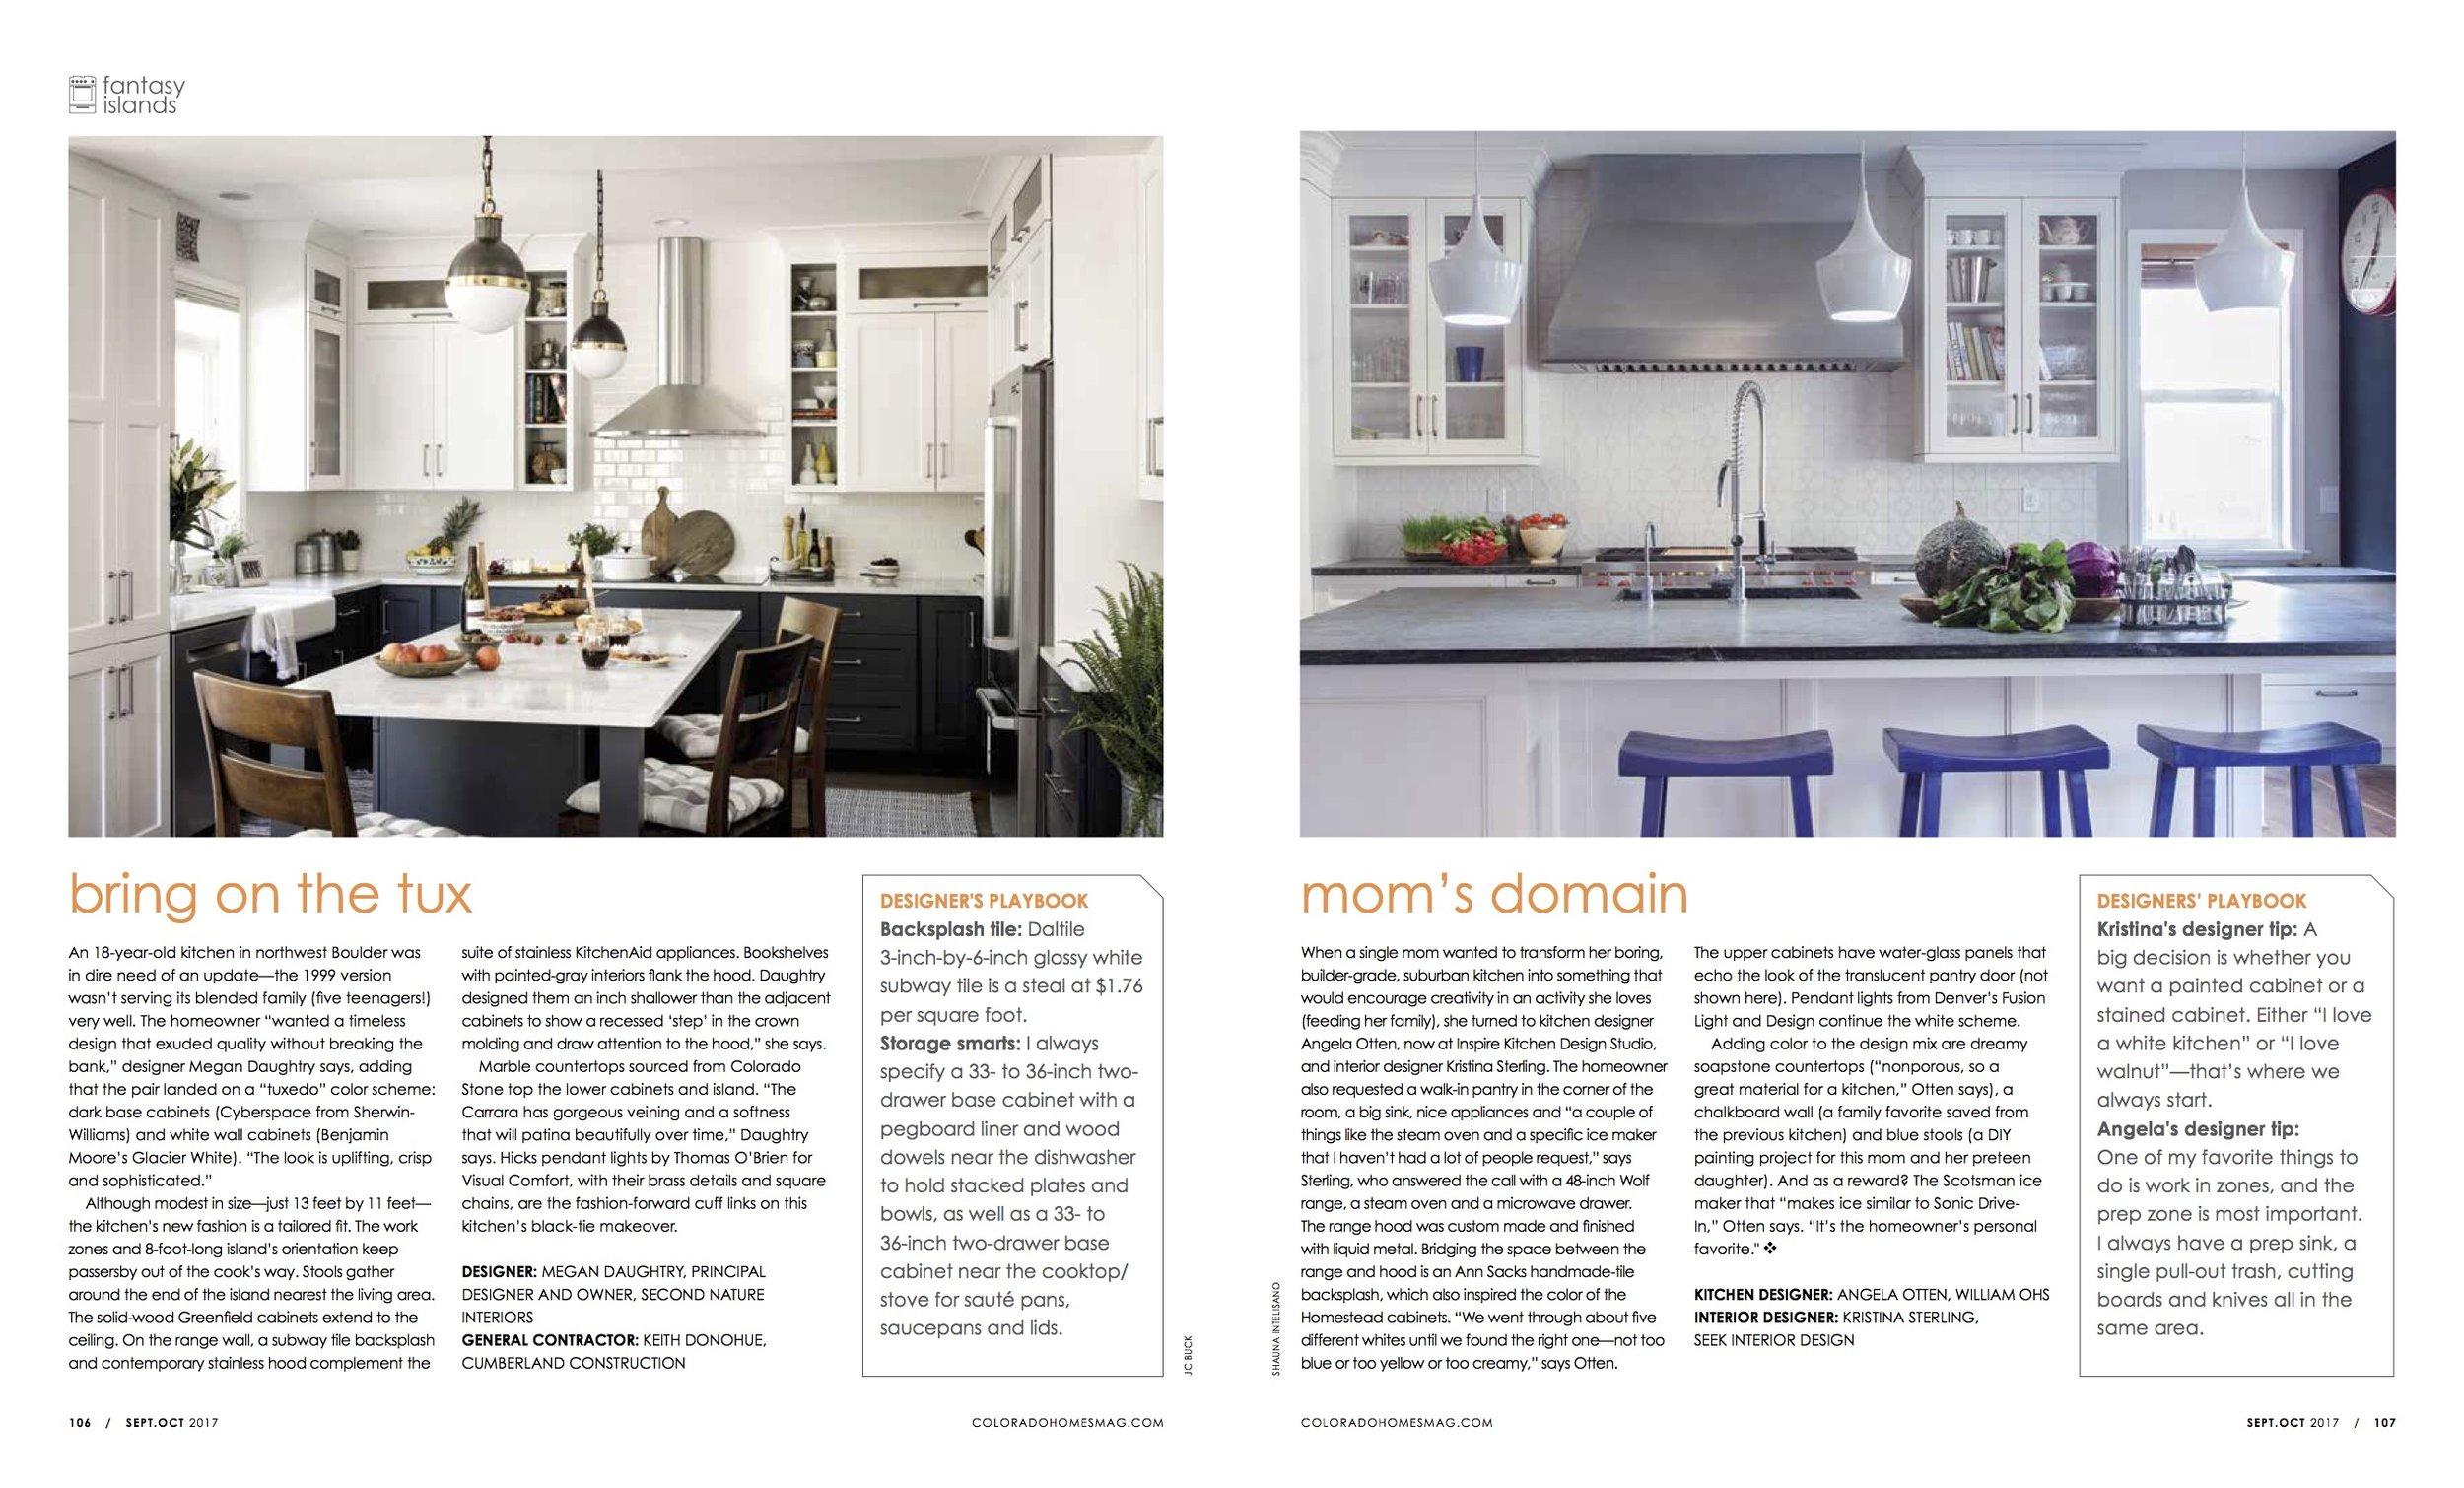 kitchens sp9.jpg